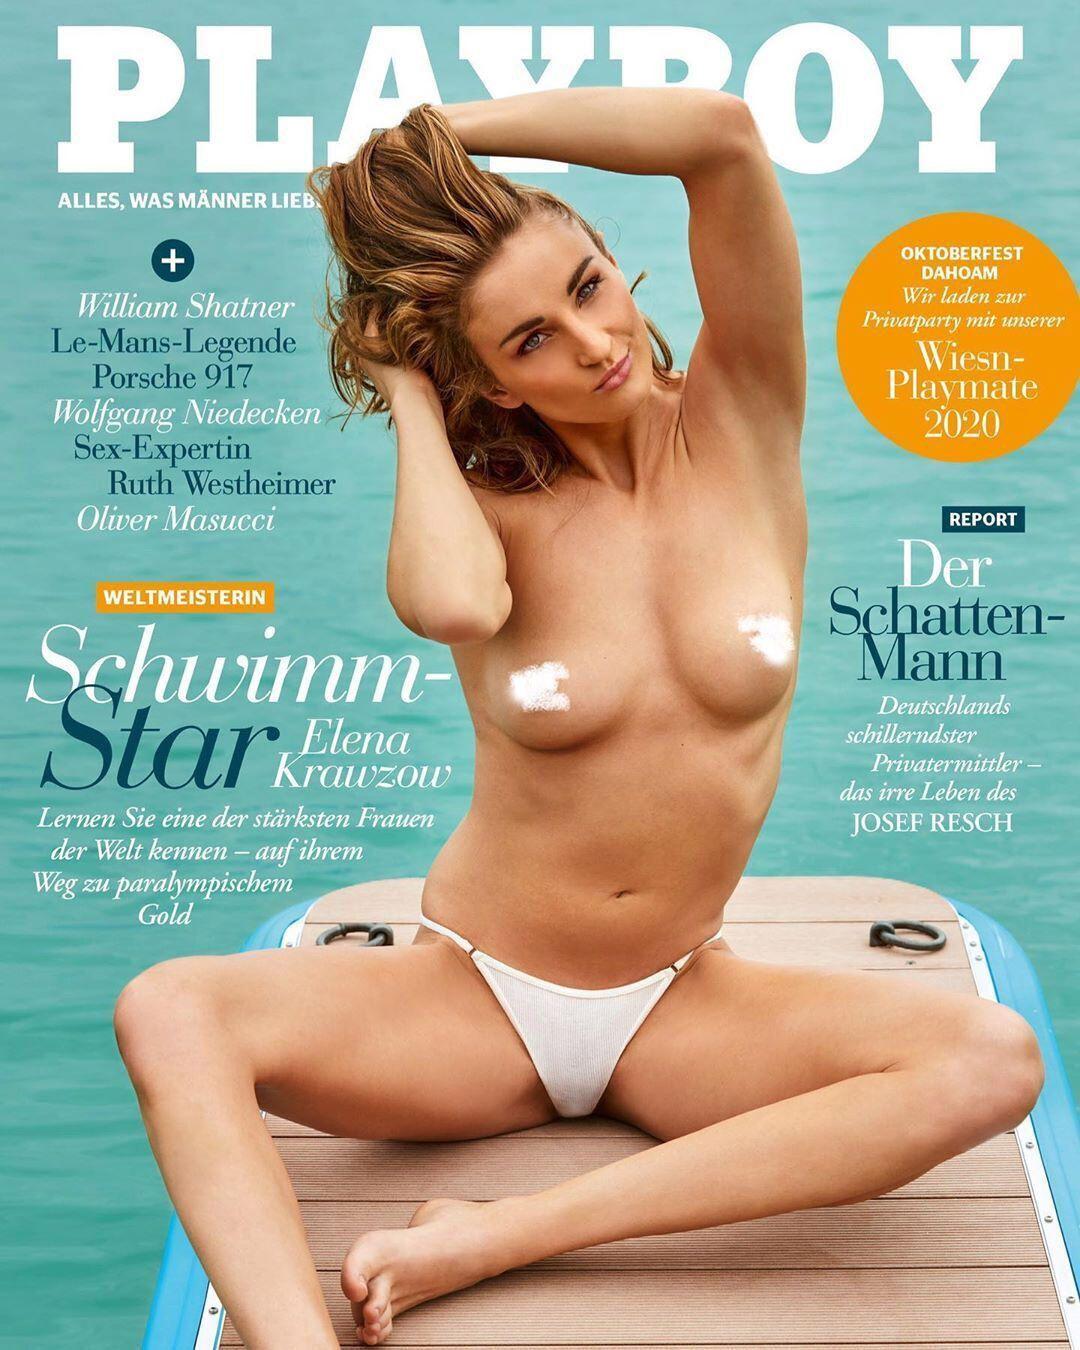 Елена Кравцов на обложке Playboy